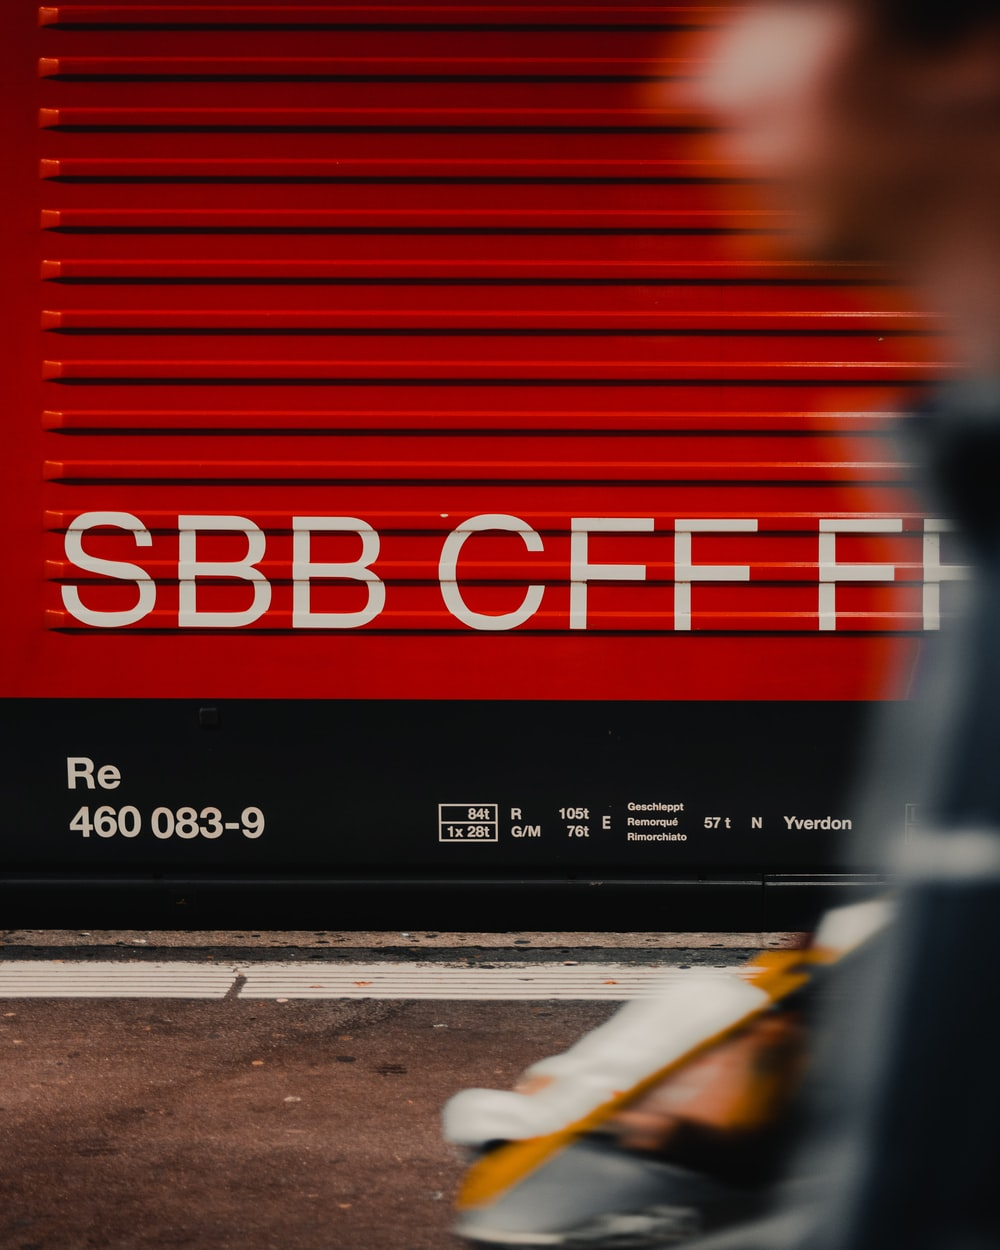 SBB CFF signage